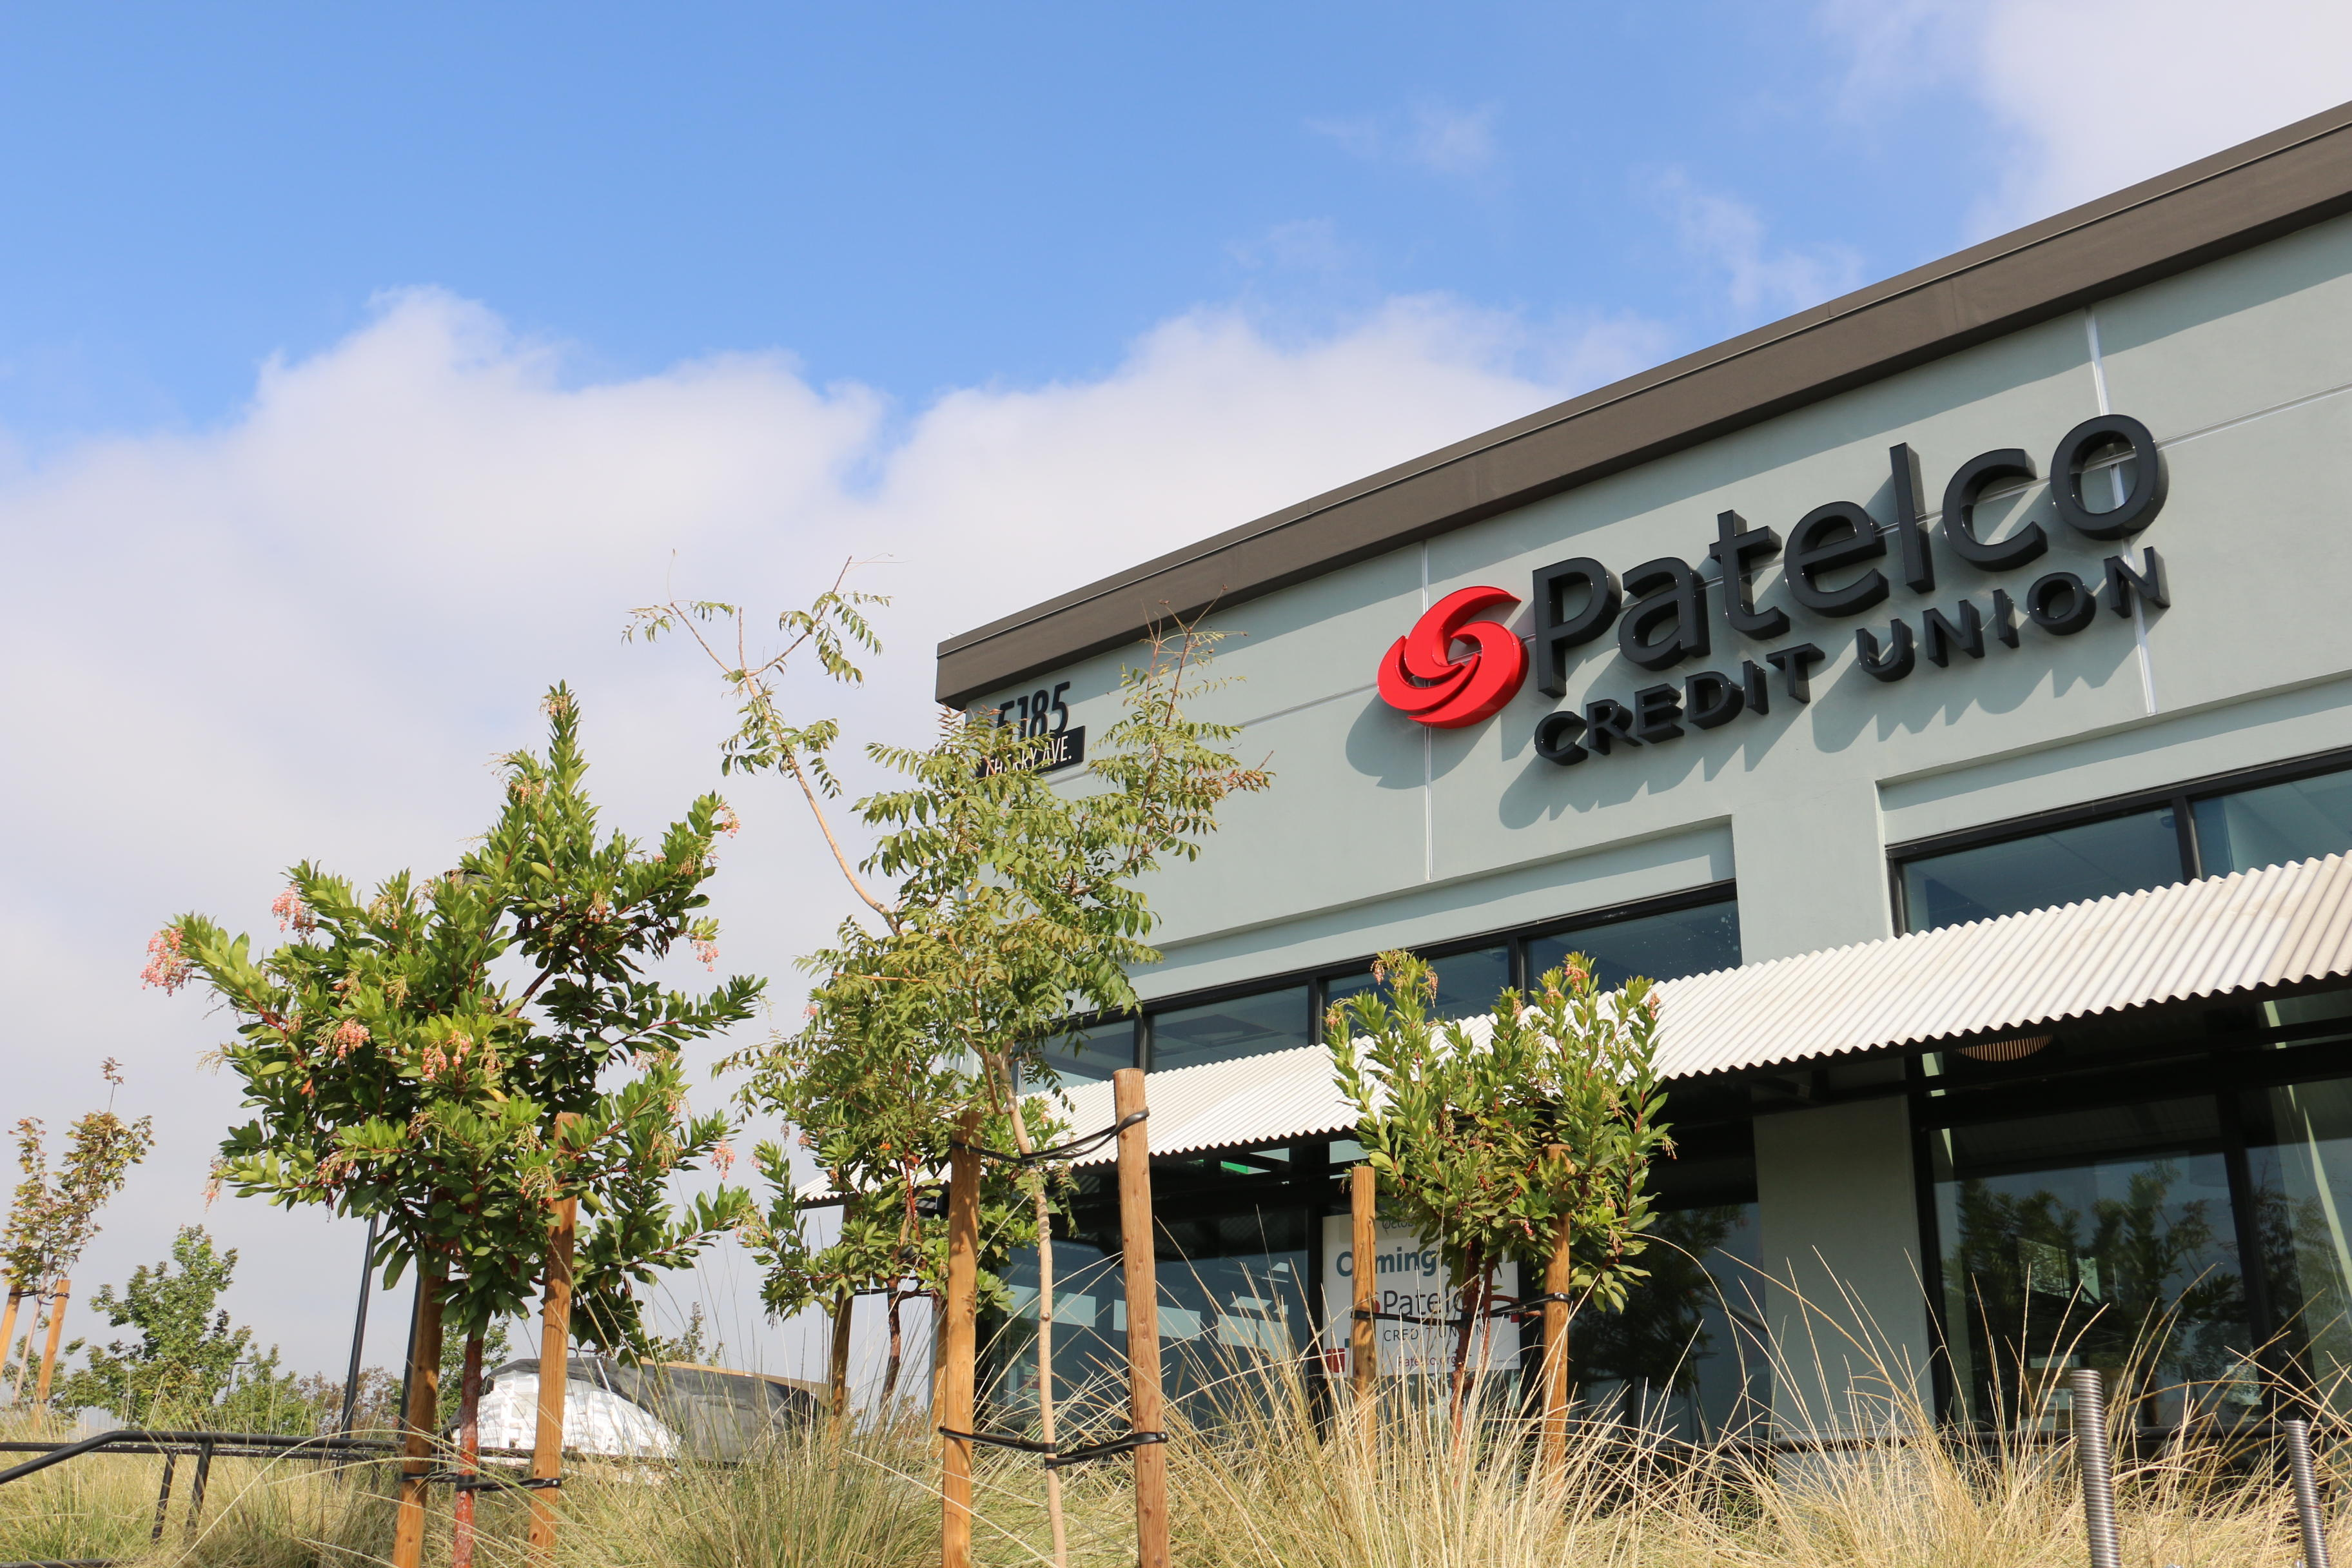 Patelco Credit Union image 1